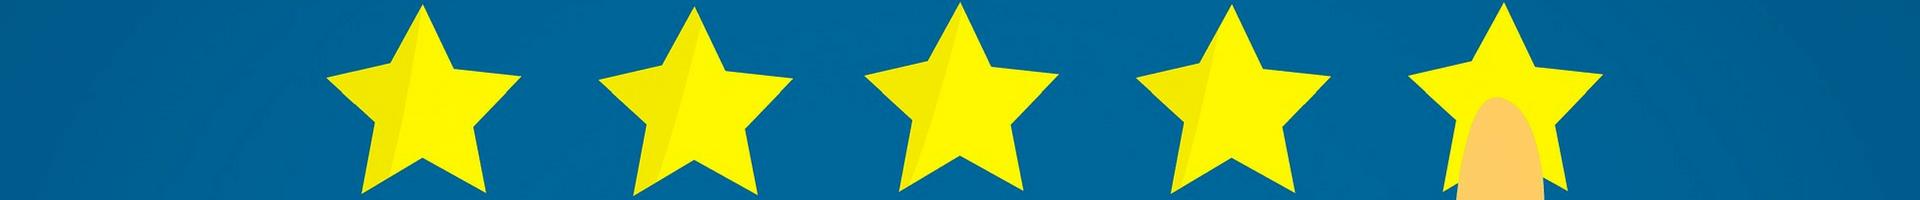 ocena-ranking-lte